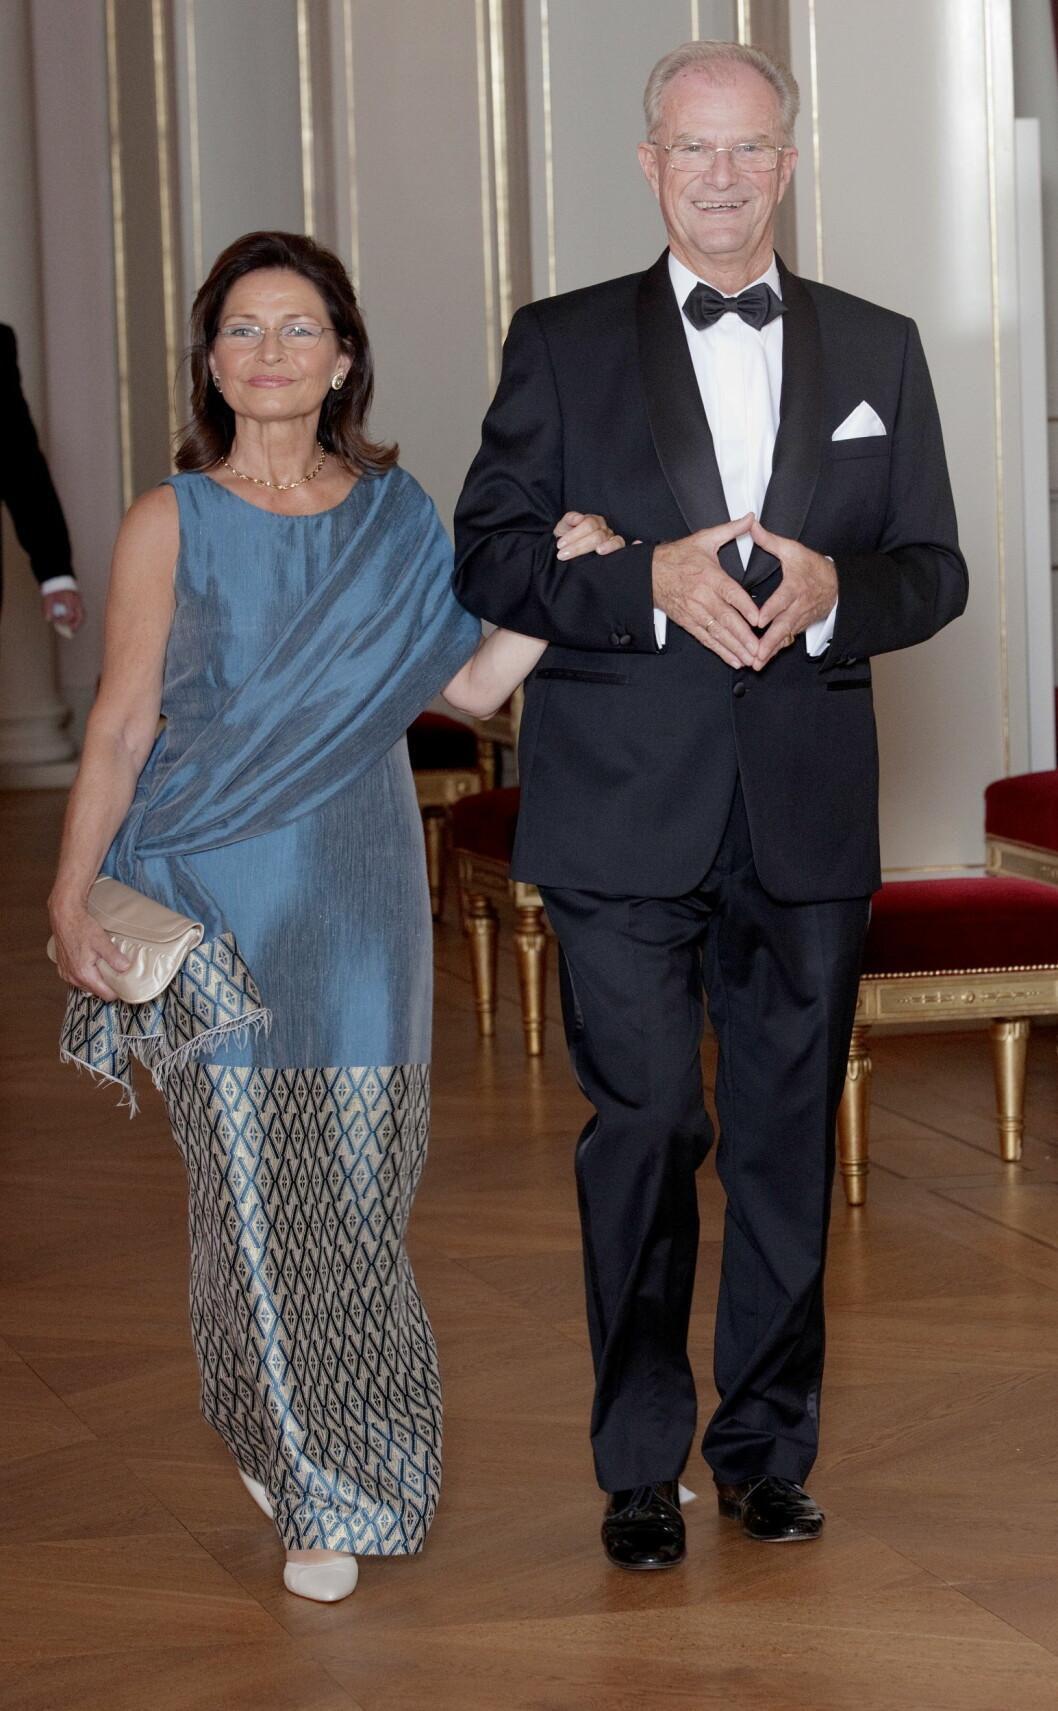 <strong>GODT GIFT:</strong> Einar Lunde og operasangerinnen Ellen Westberg Andersen har to barn sammen. Her ankommer de en gallamiddag på Slottet i anledning statsbesøk fra Sør-Afrika i 2011.  Foto: NTB scanpix